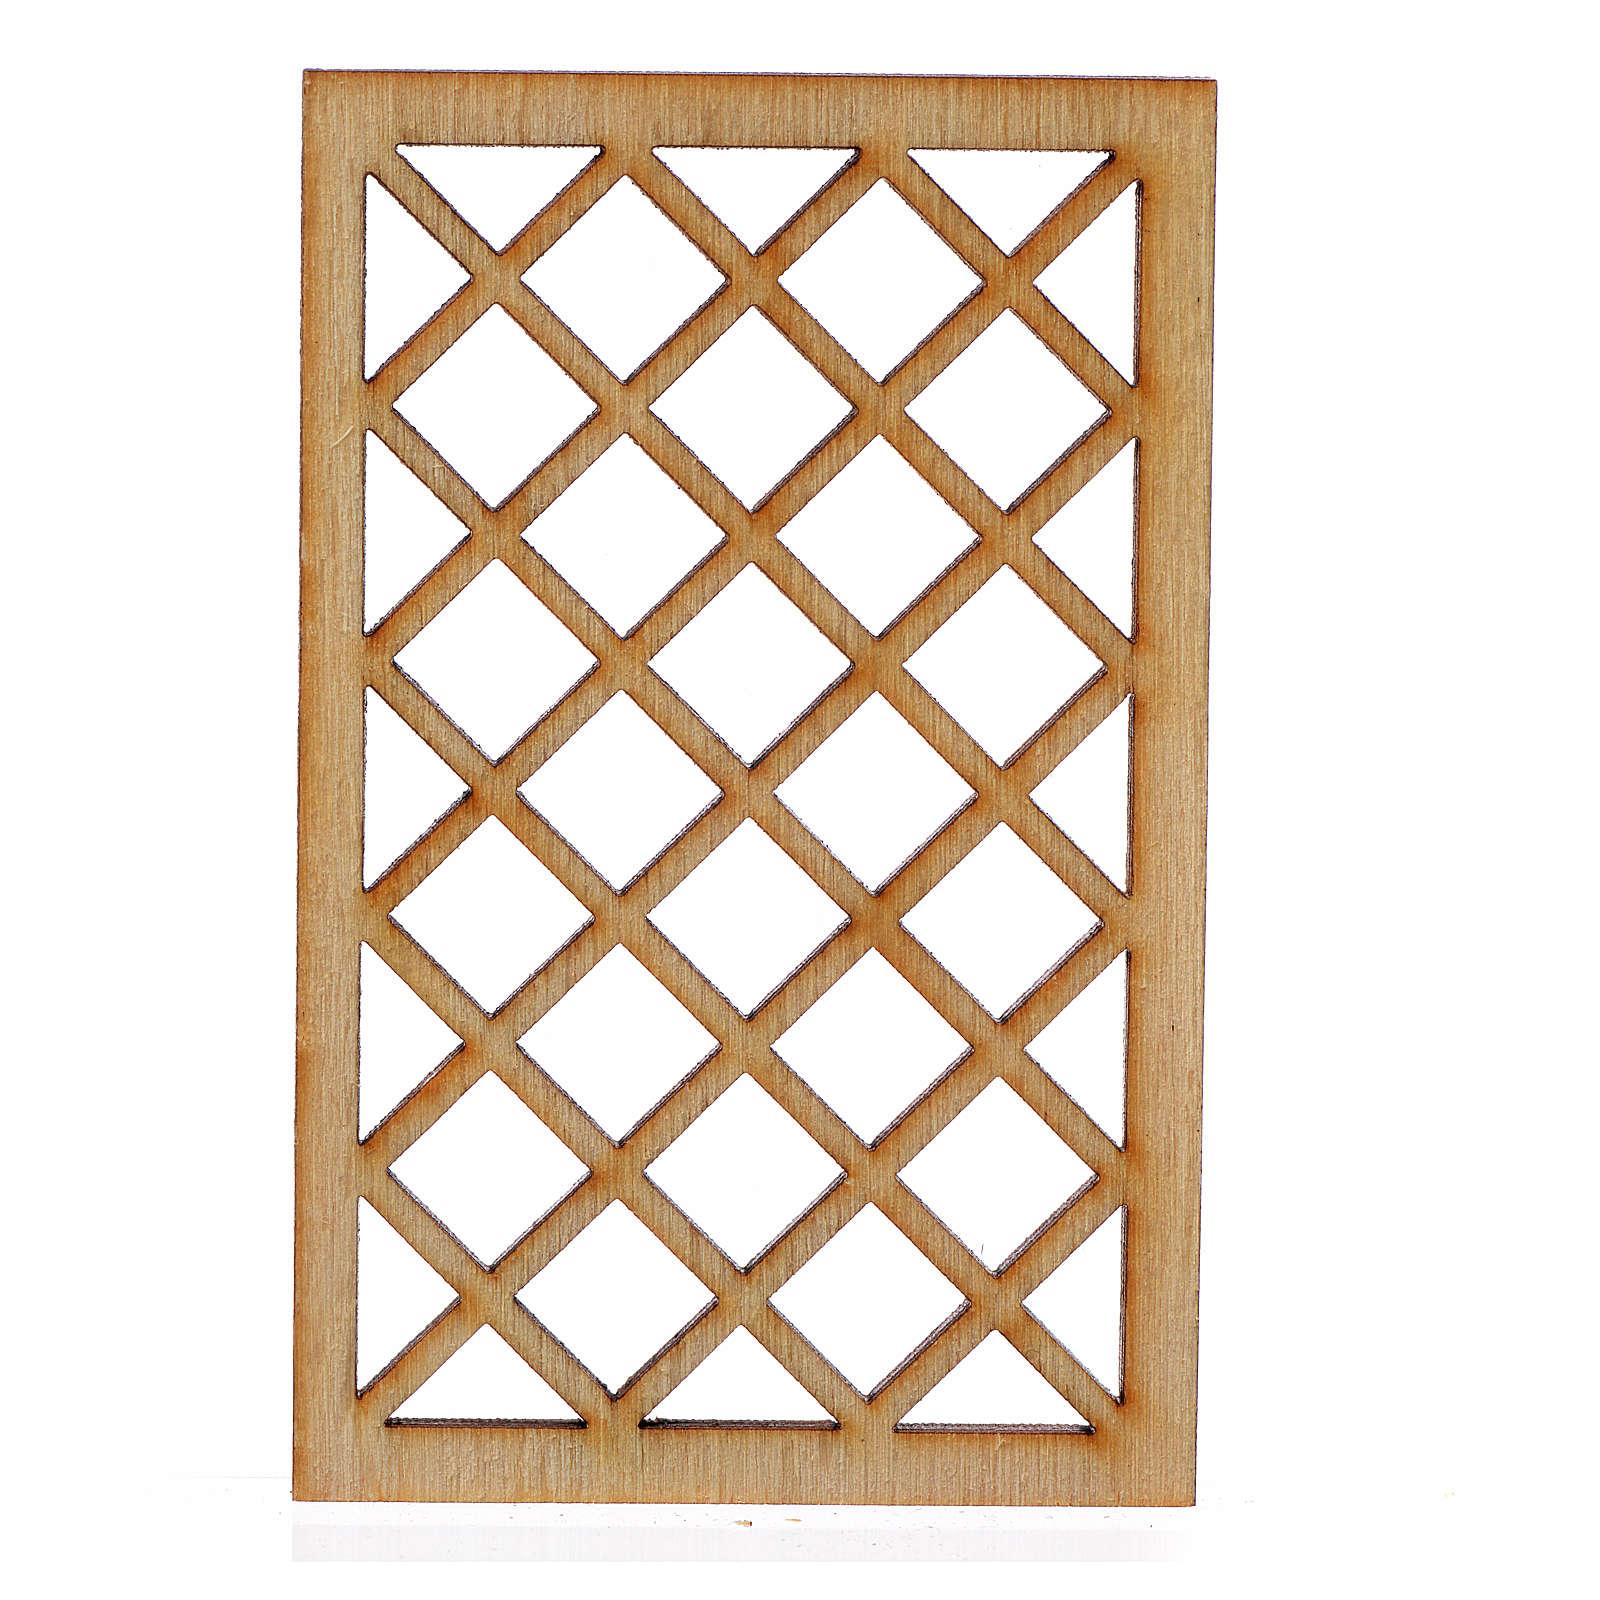 Inferriata presepe legno 7x4,5 cm 4